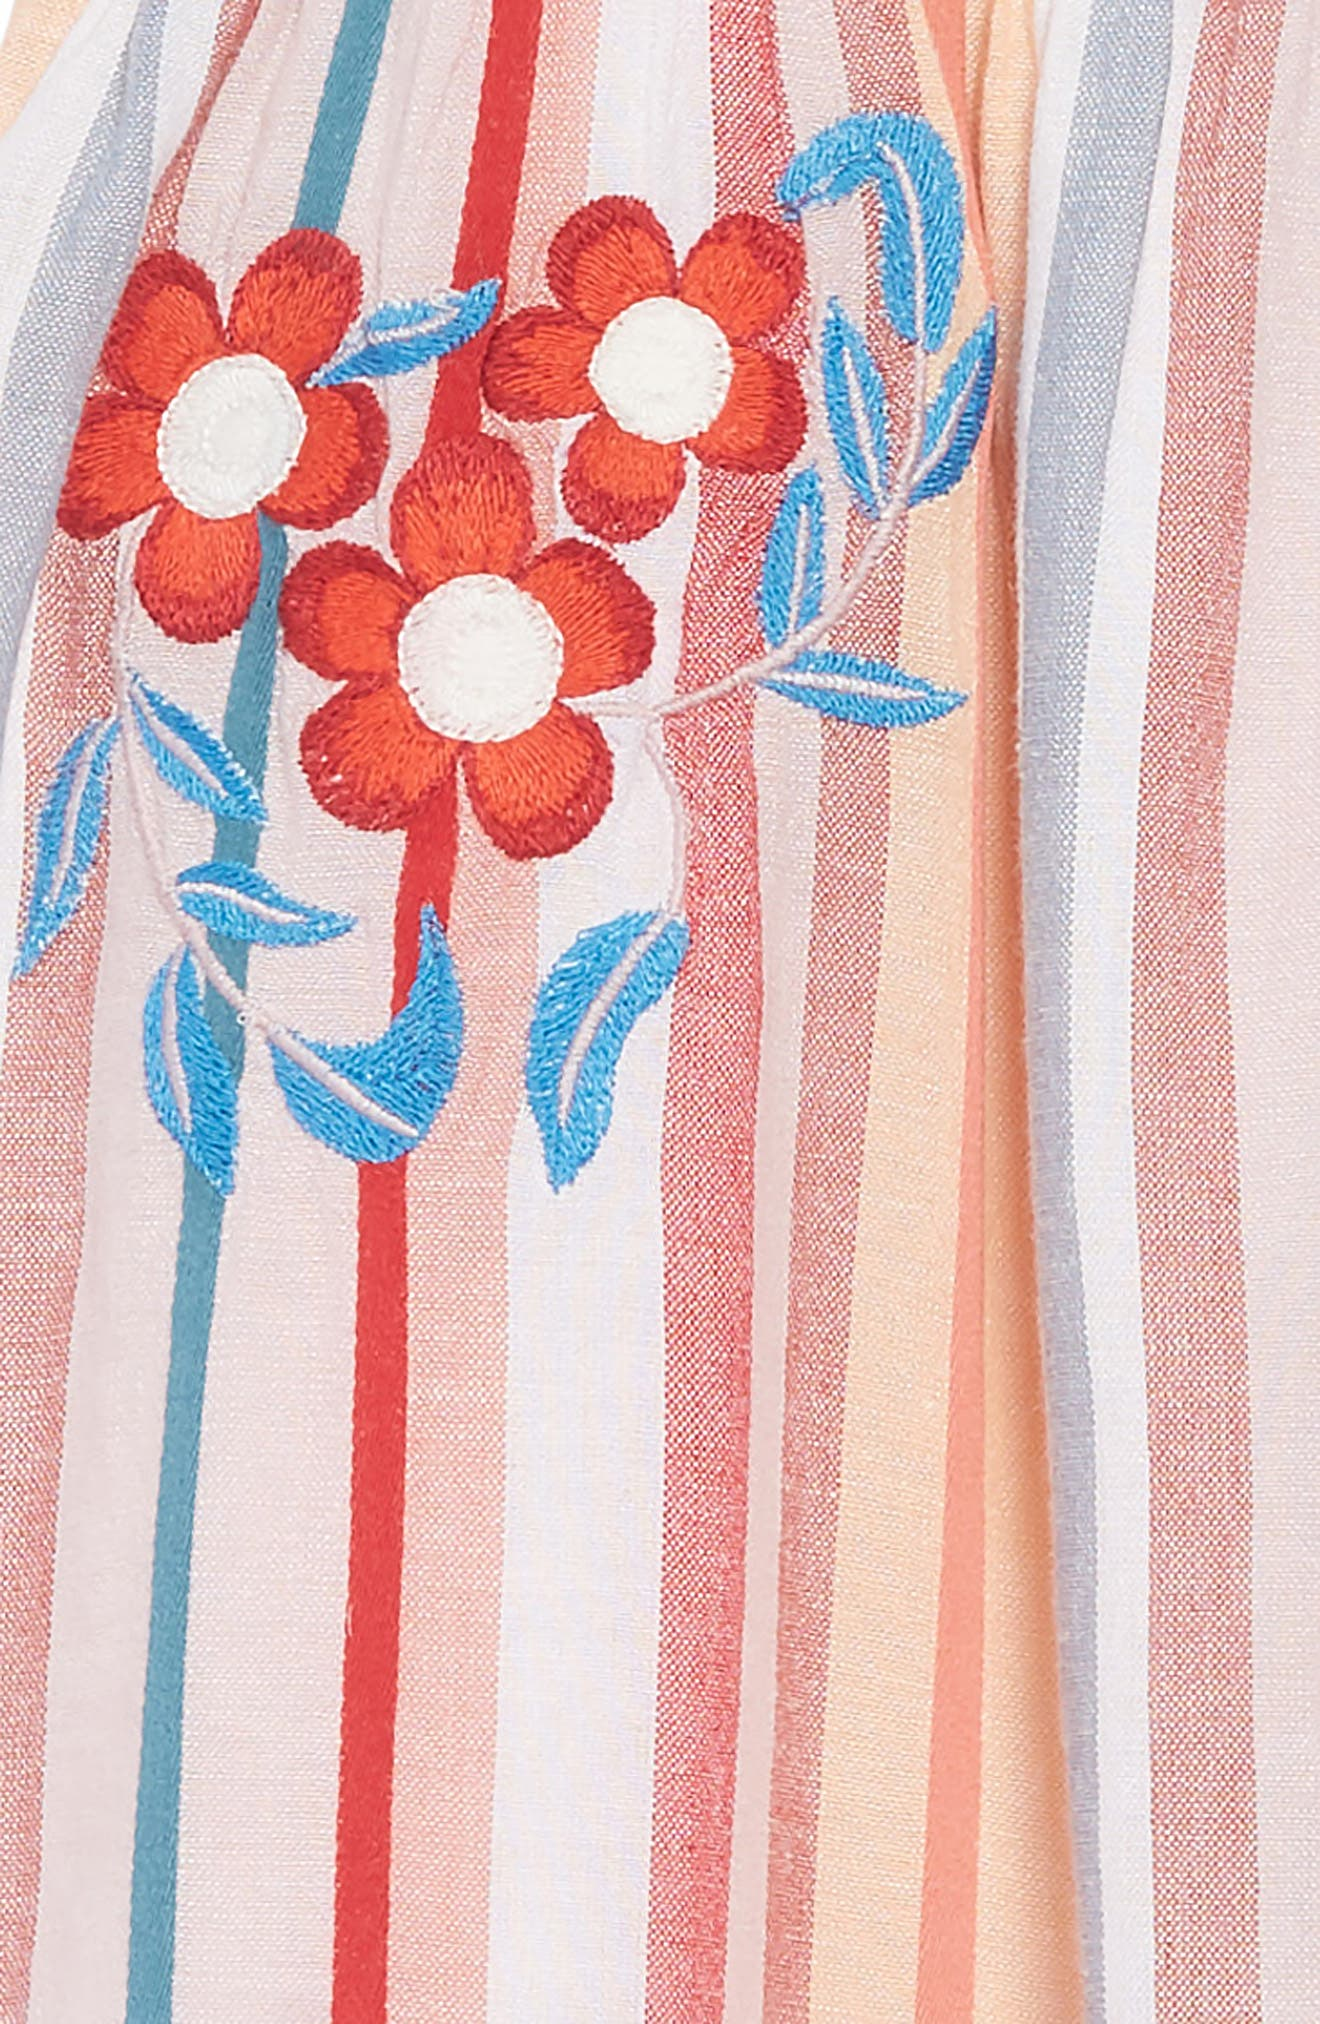 Embroidered Stripe Dress,                             Alternate thumbnail 3, color,                             IVORY EGRET MULTI STRIPE